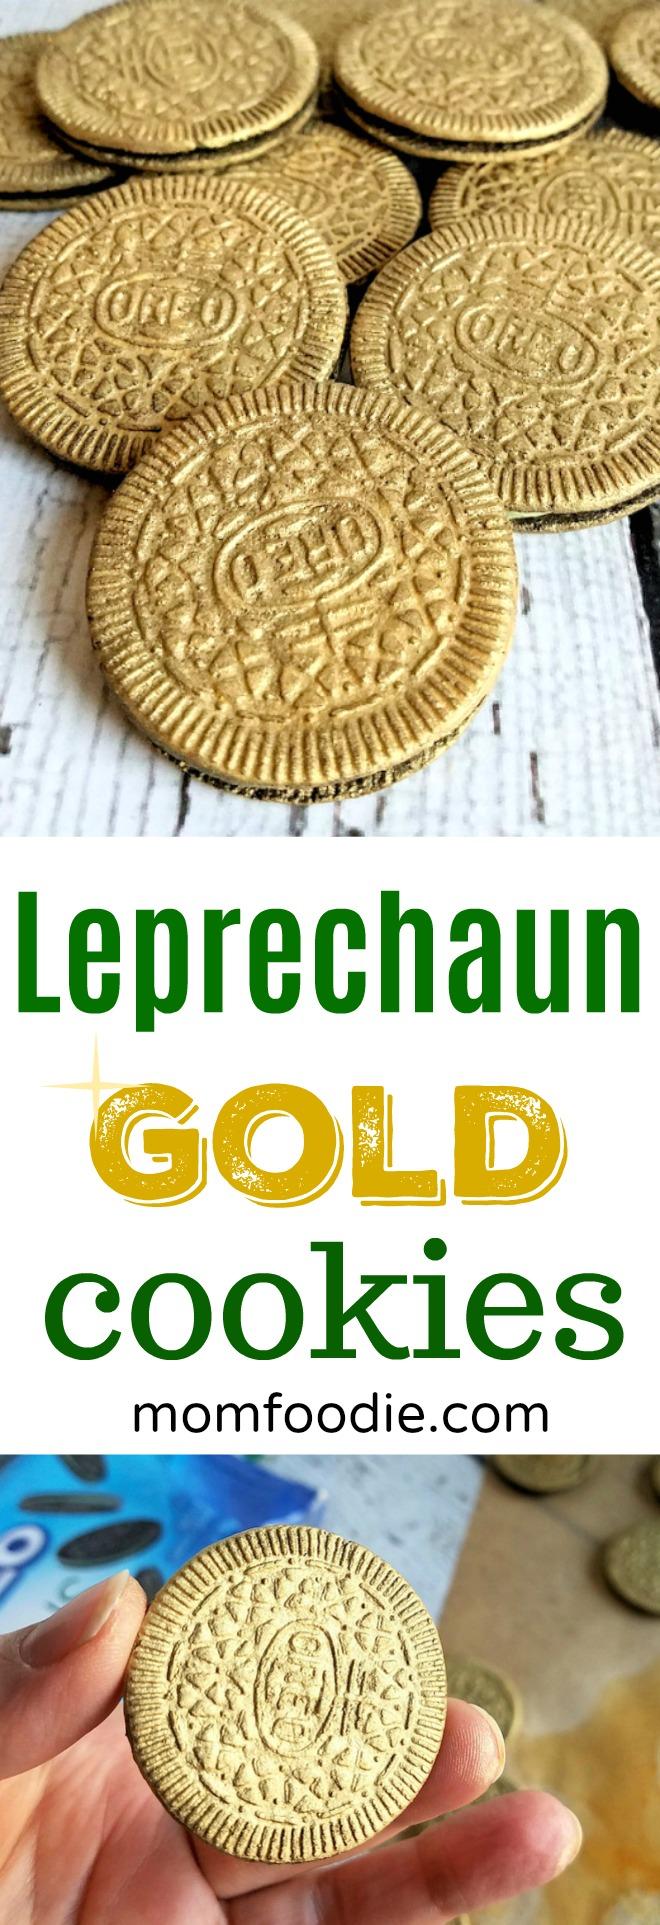 Leprechaun Gold St Patricks Day Cookies #stpatricksday #leprechaun #cookies #stpatricks #oreos